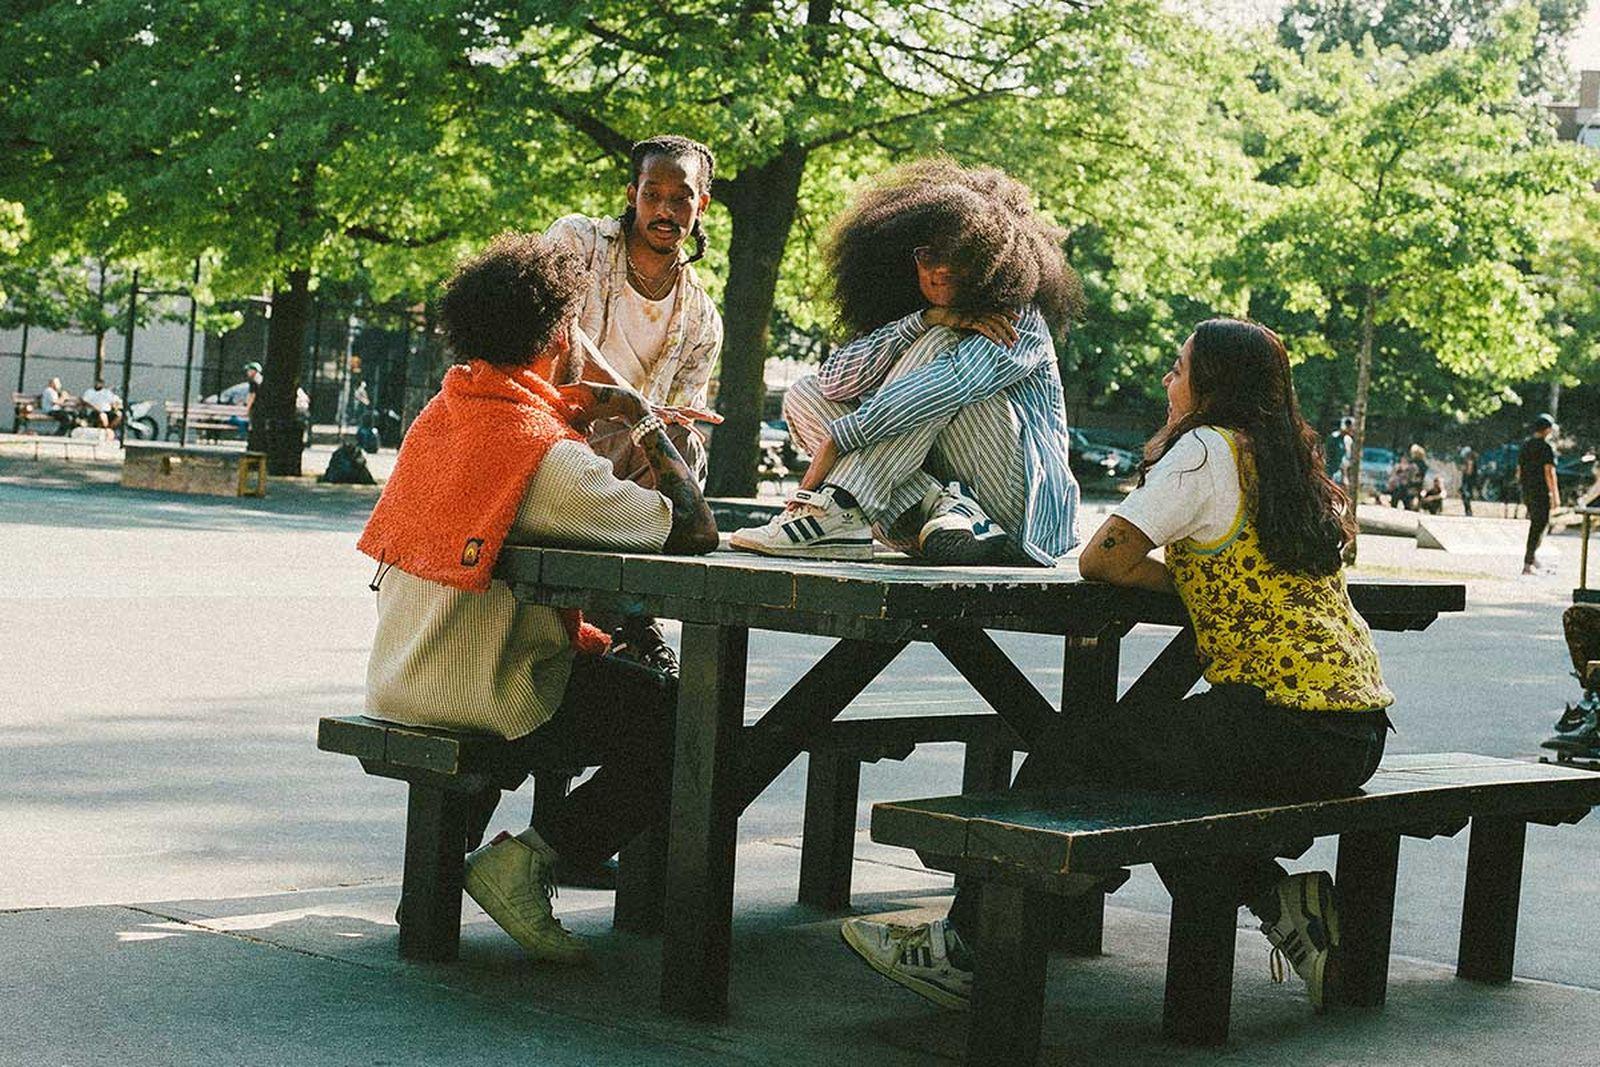 From left: Sudan Green, Jamier Burden, Veronica Eahdami, and Giselle Hernandez.